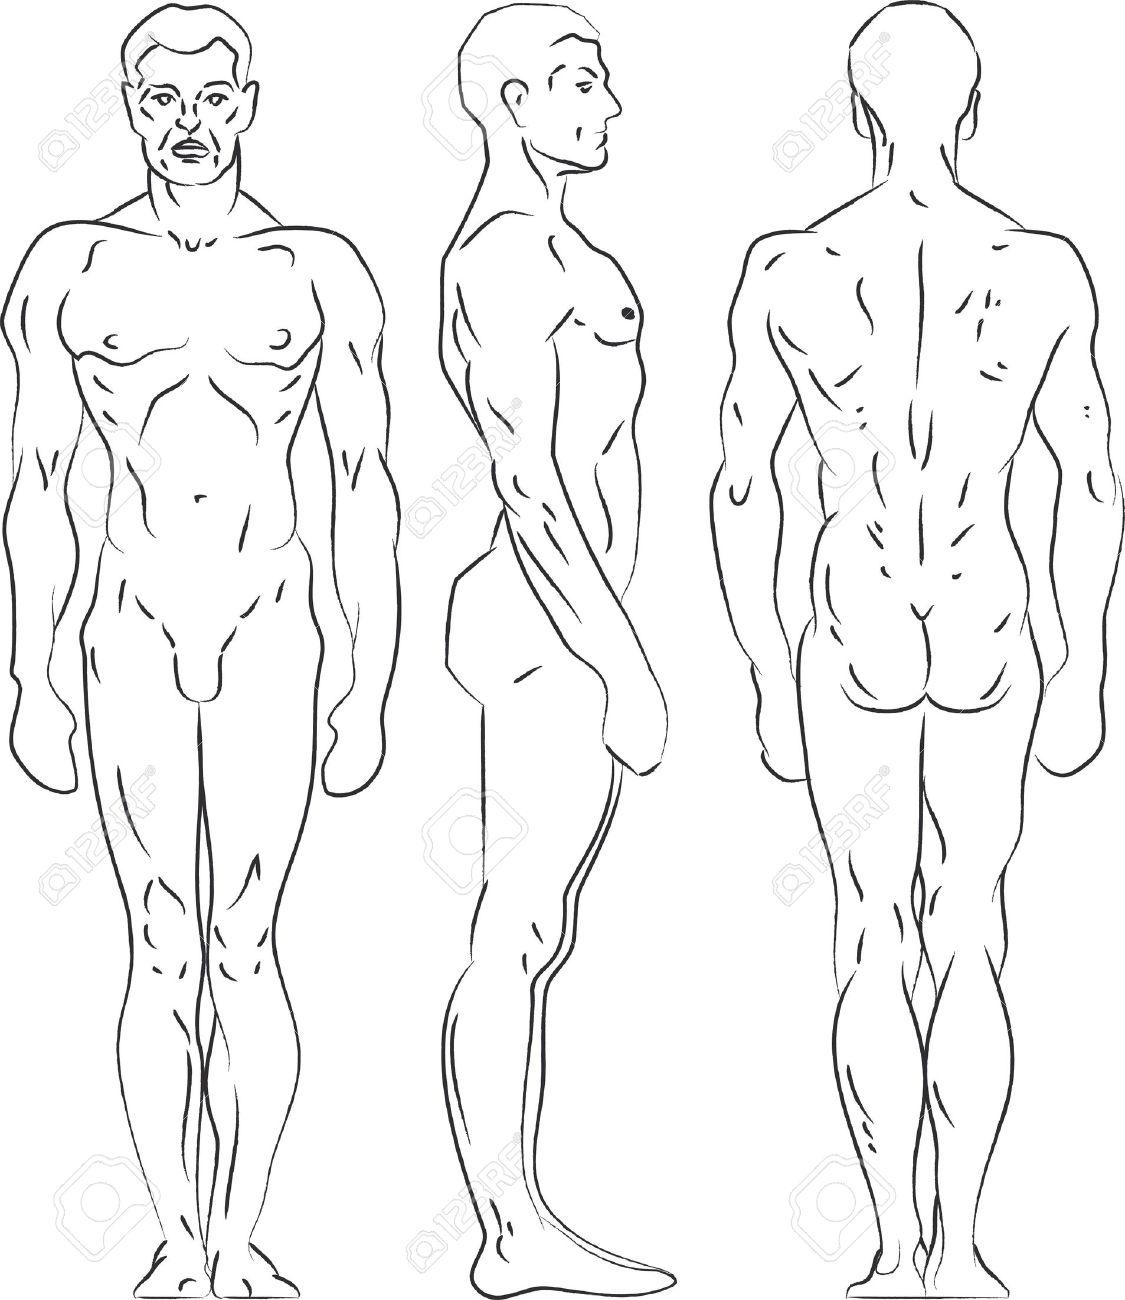 Contorno Figura Ilustración Masculino. Perfil, Vista Frontal ...